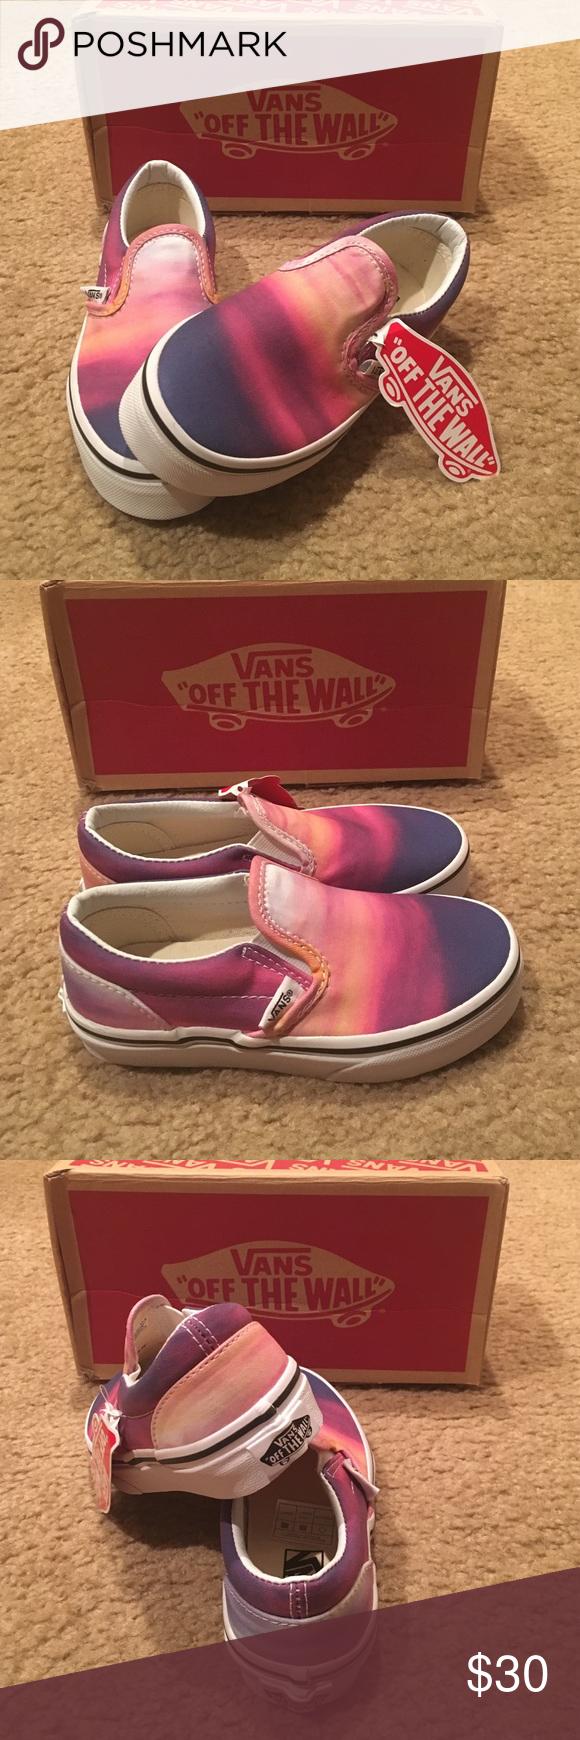 03fd8b3733 Girls Vans Classic slip-ons New in box. Sunset purple true white. Vans Shoes  Sneakers